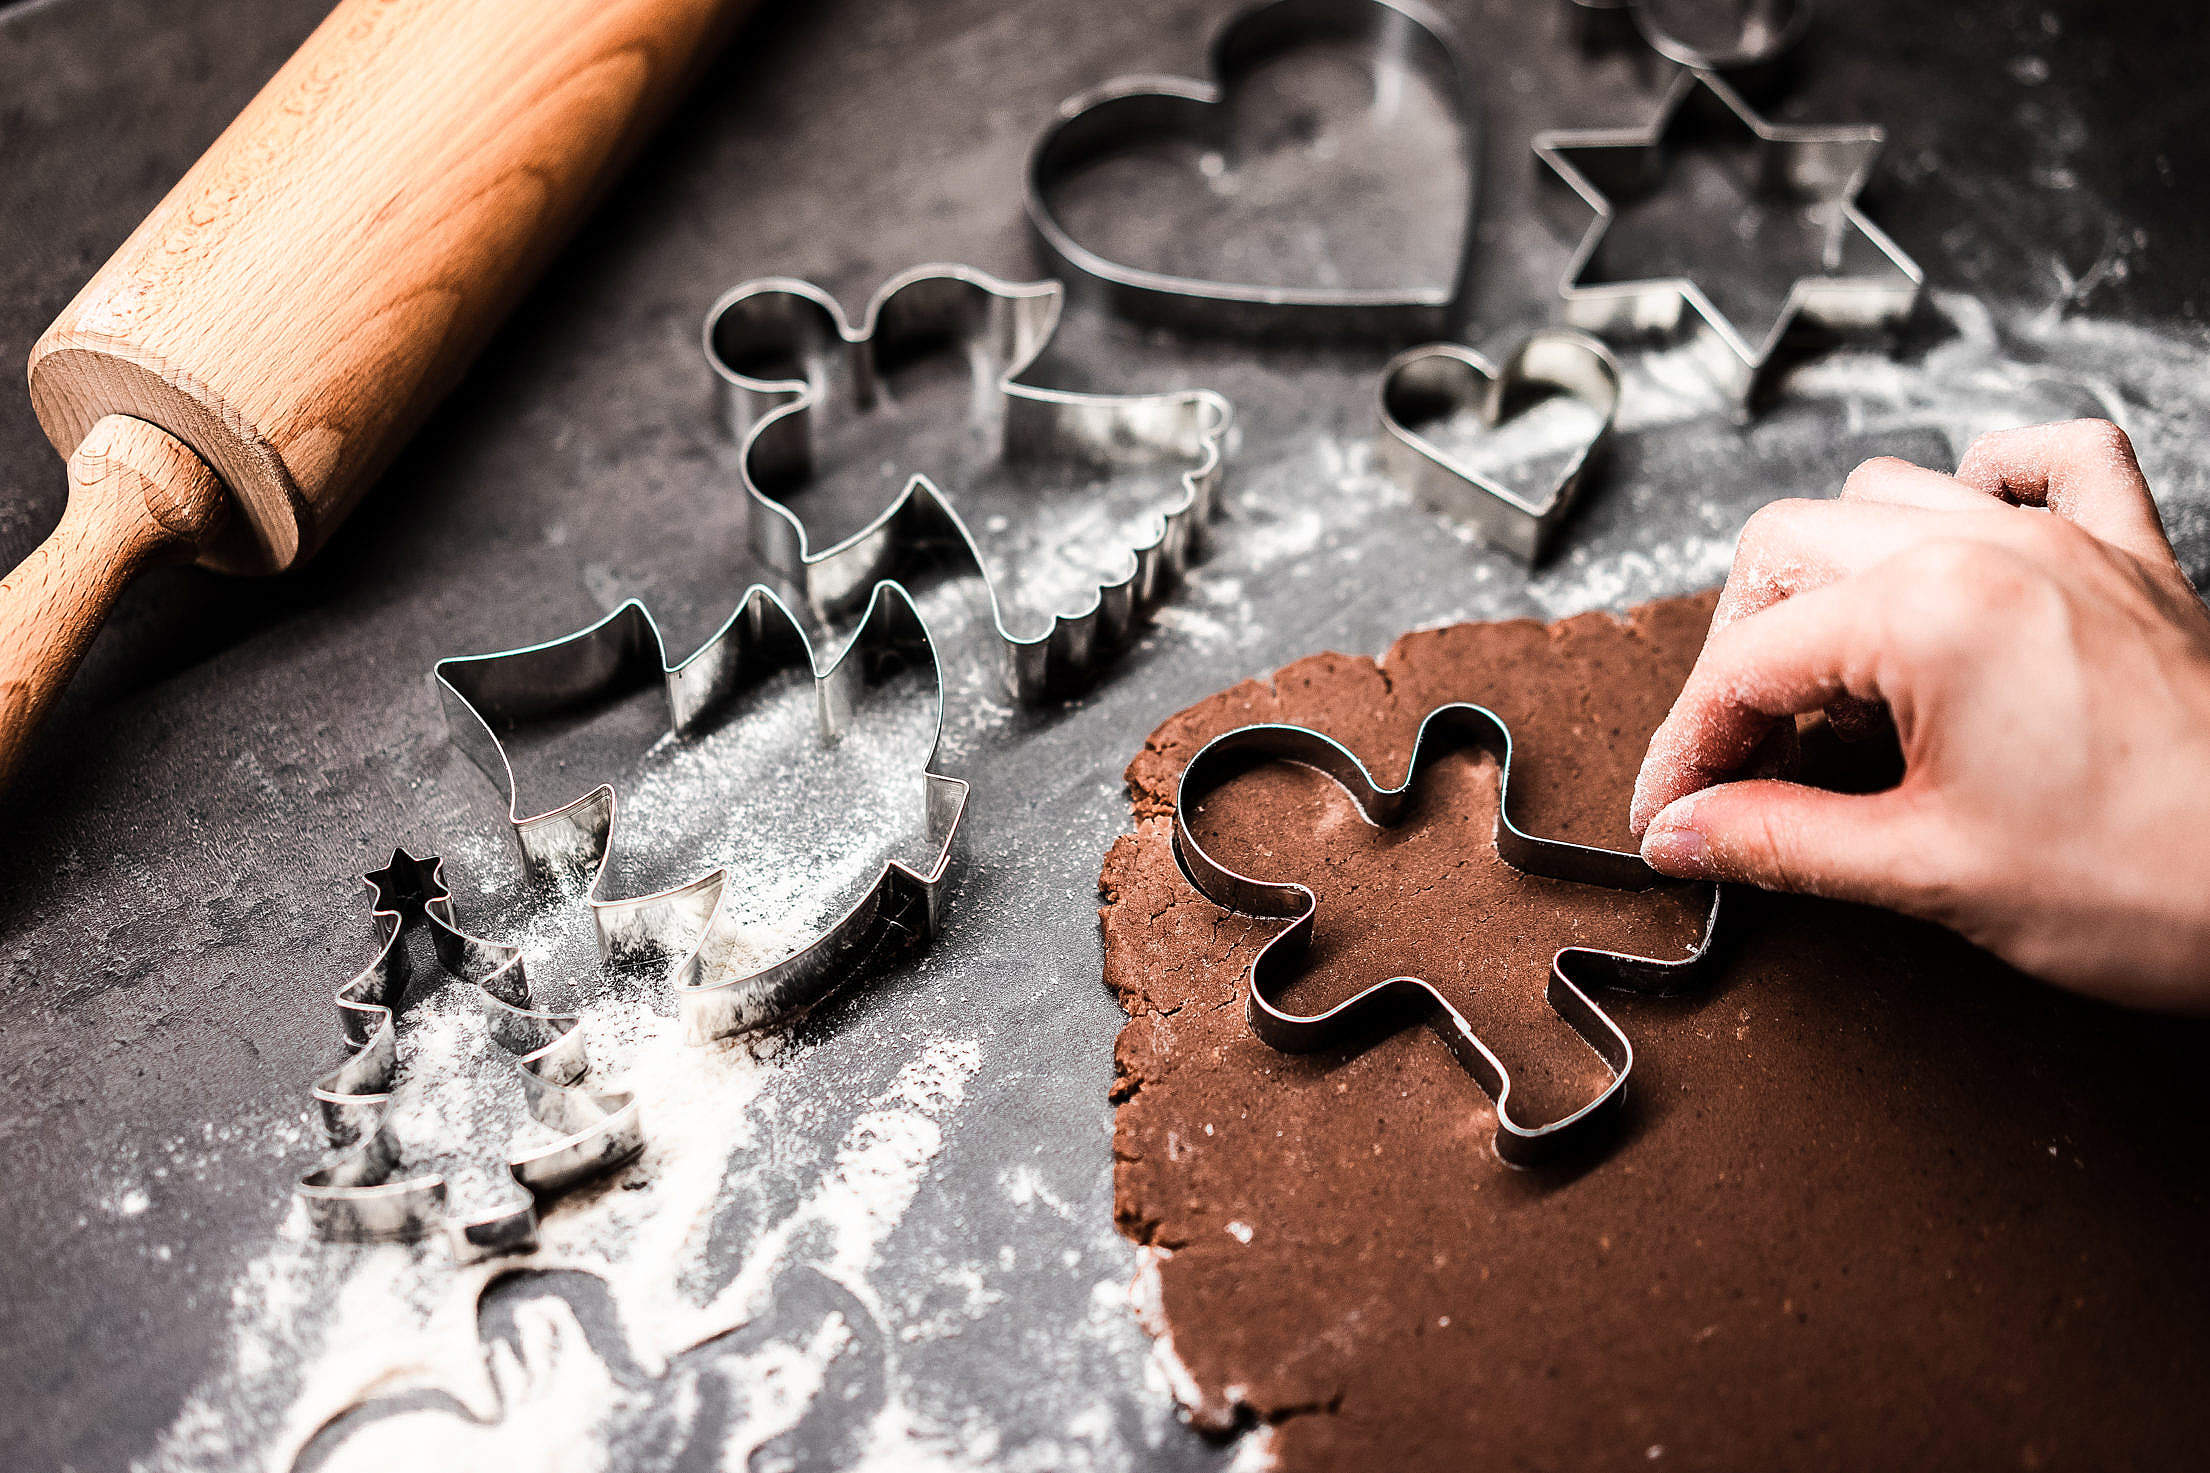 Cutting Gingerbread Man at Christmas Free Stock Photo